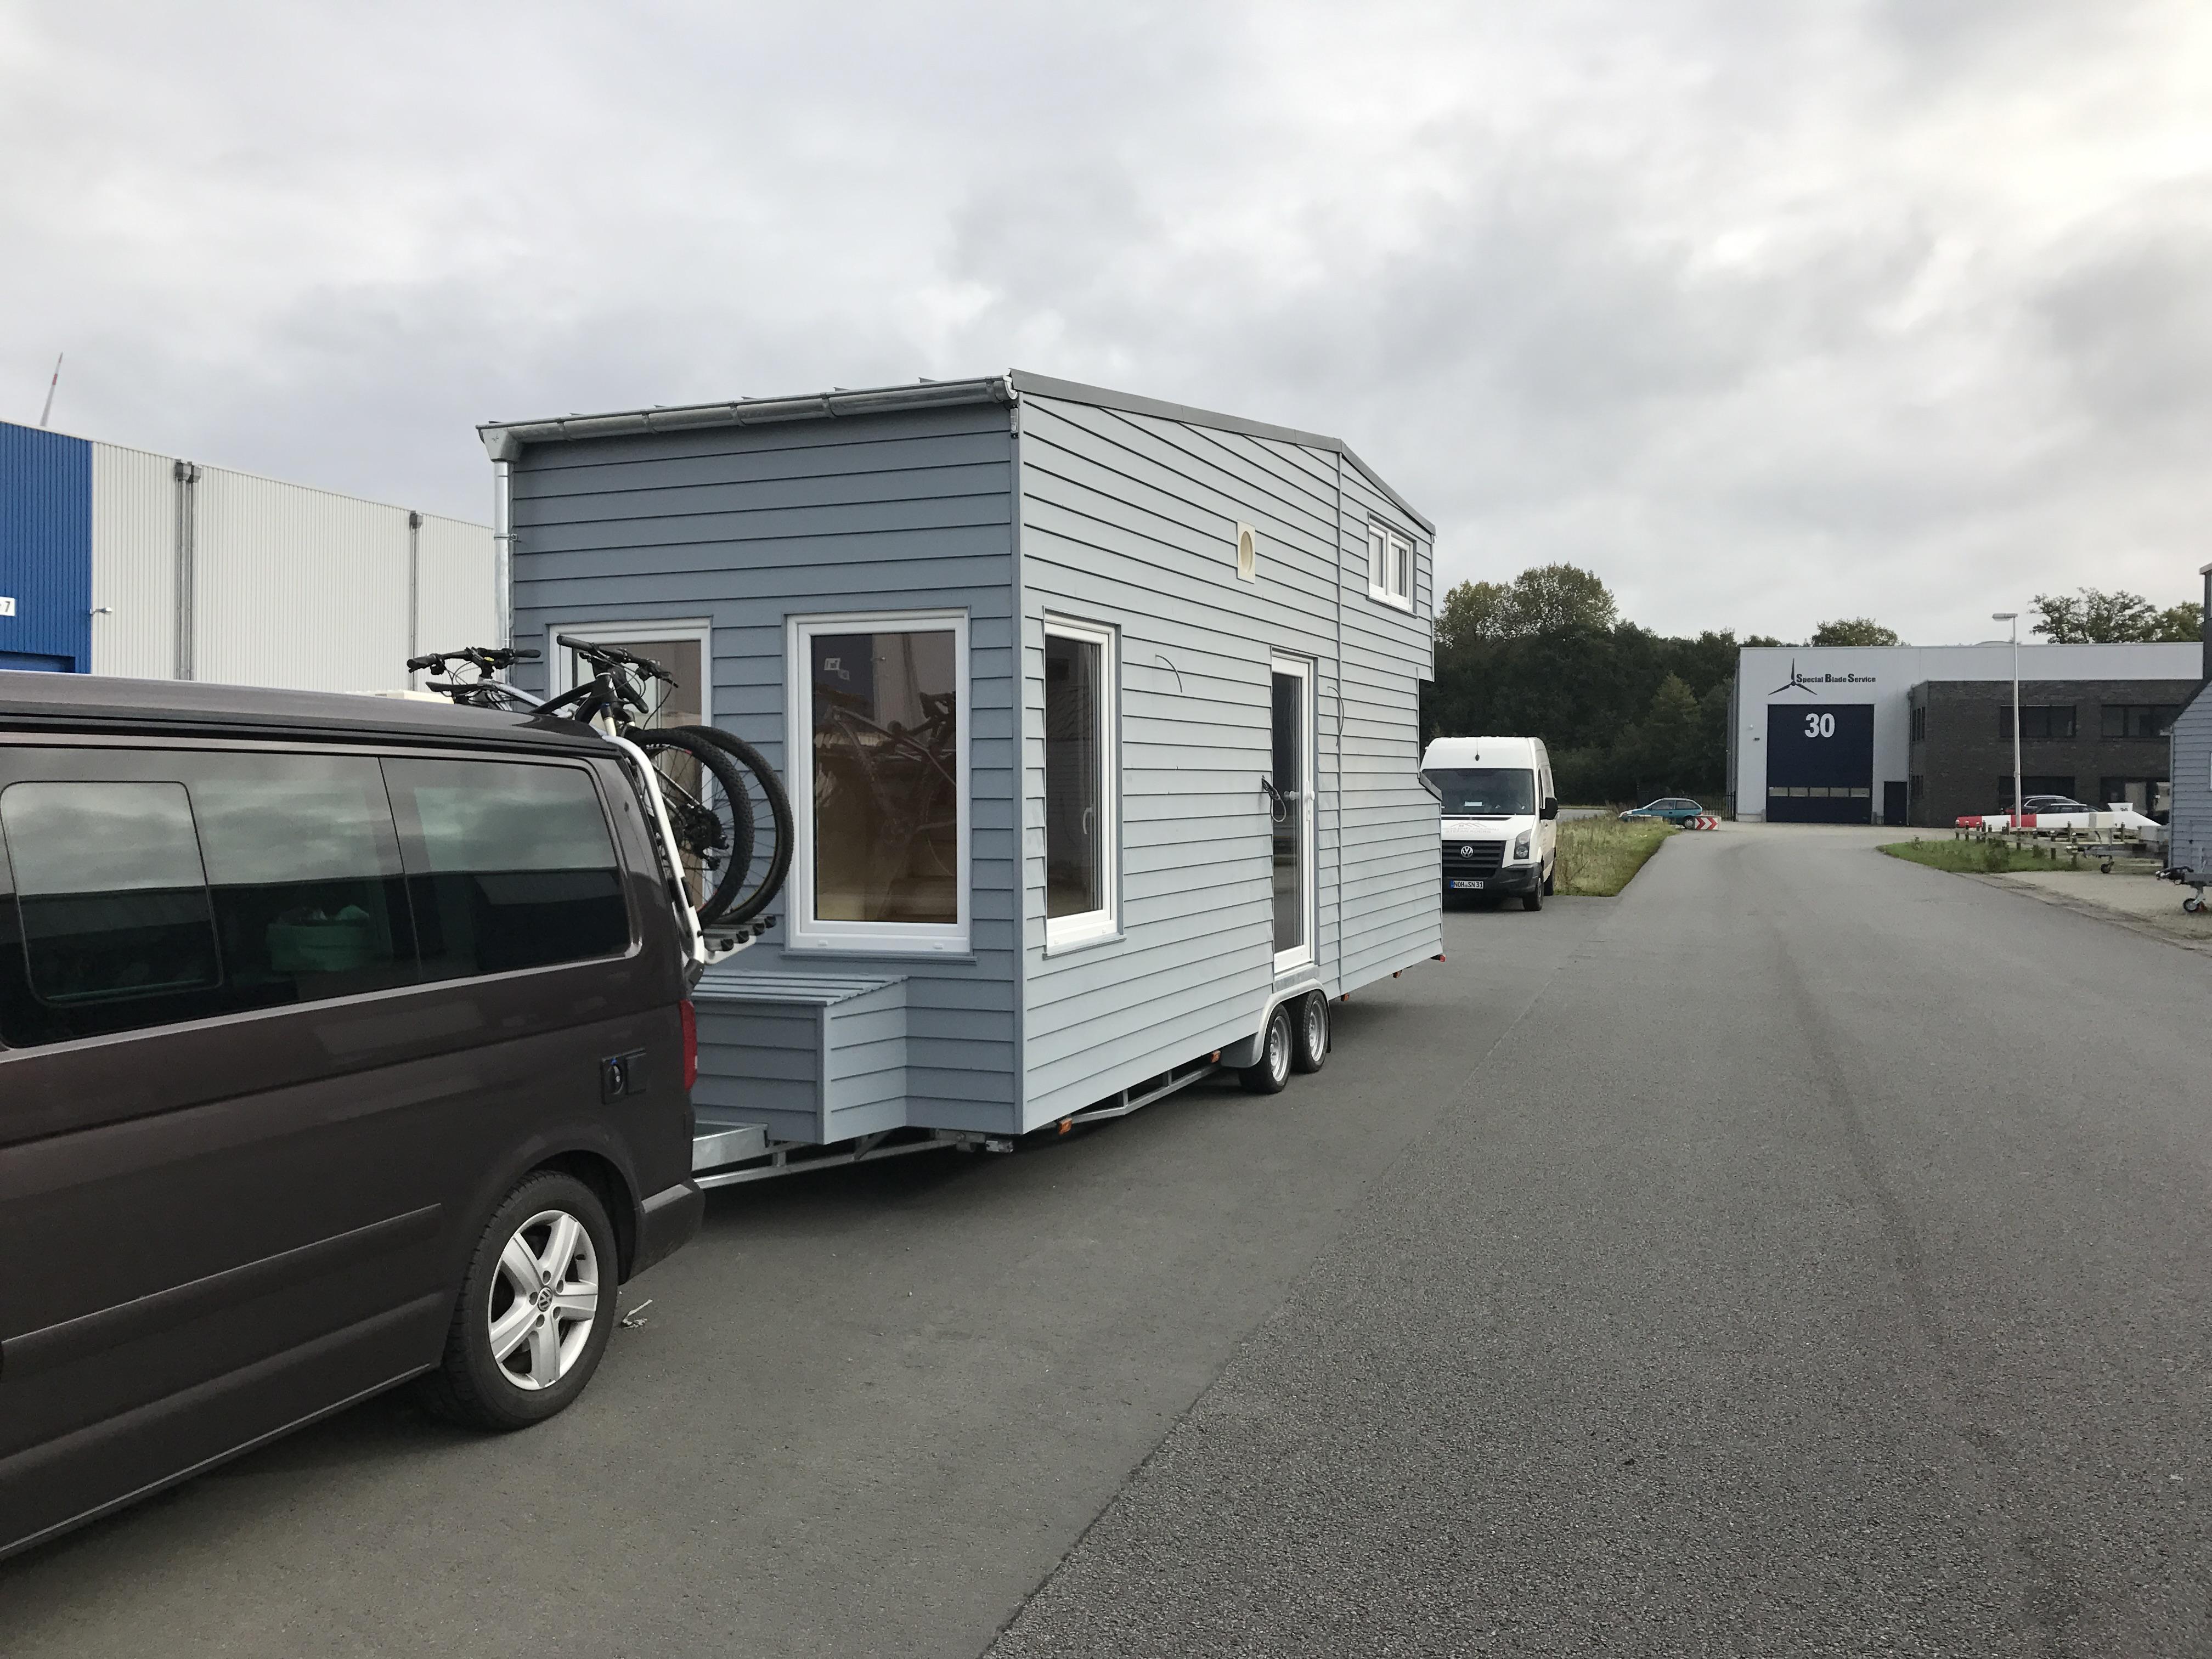 Koersmann - Ihr Tiny House Anbieter